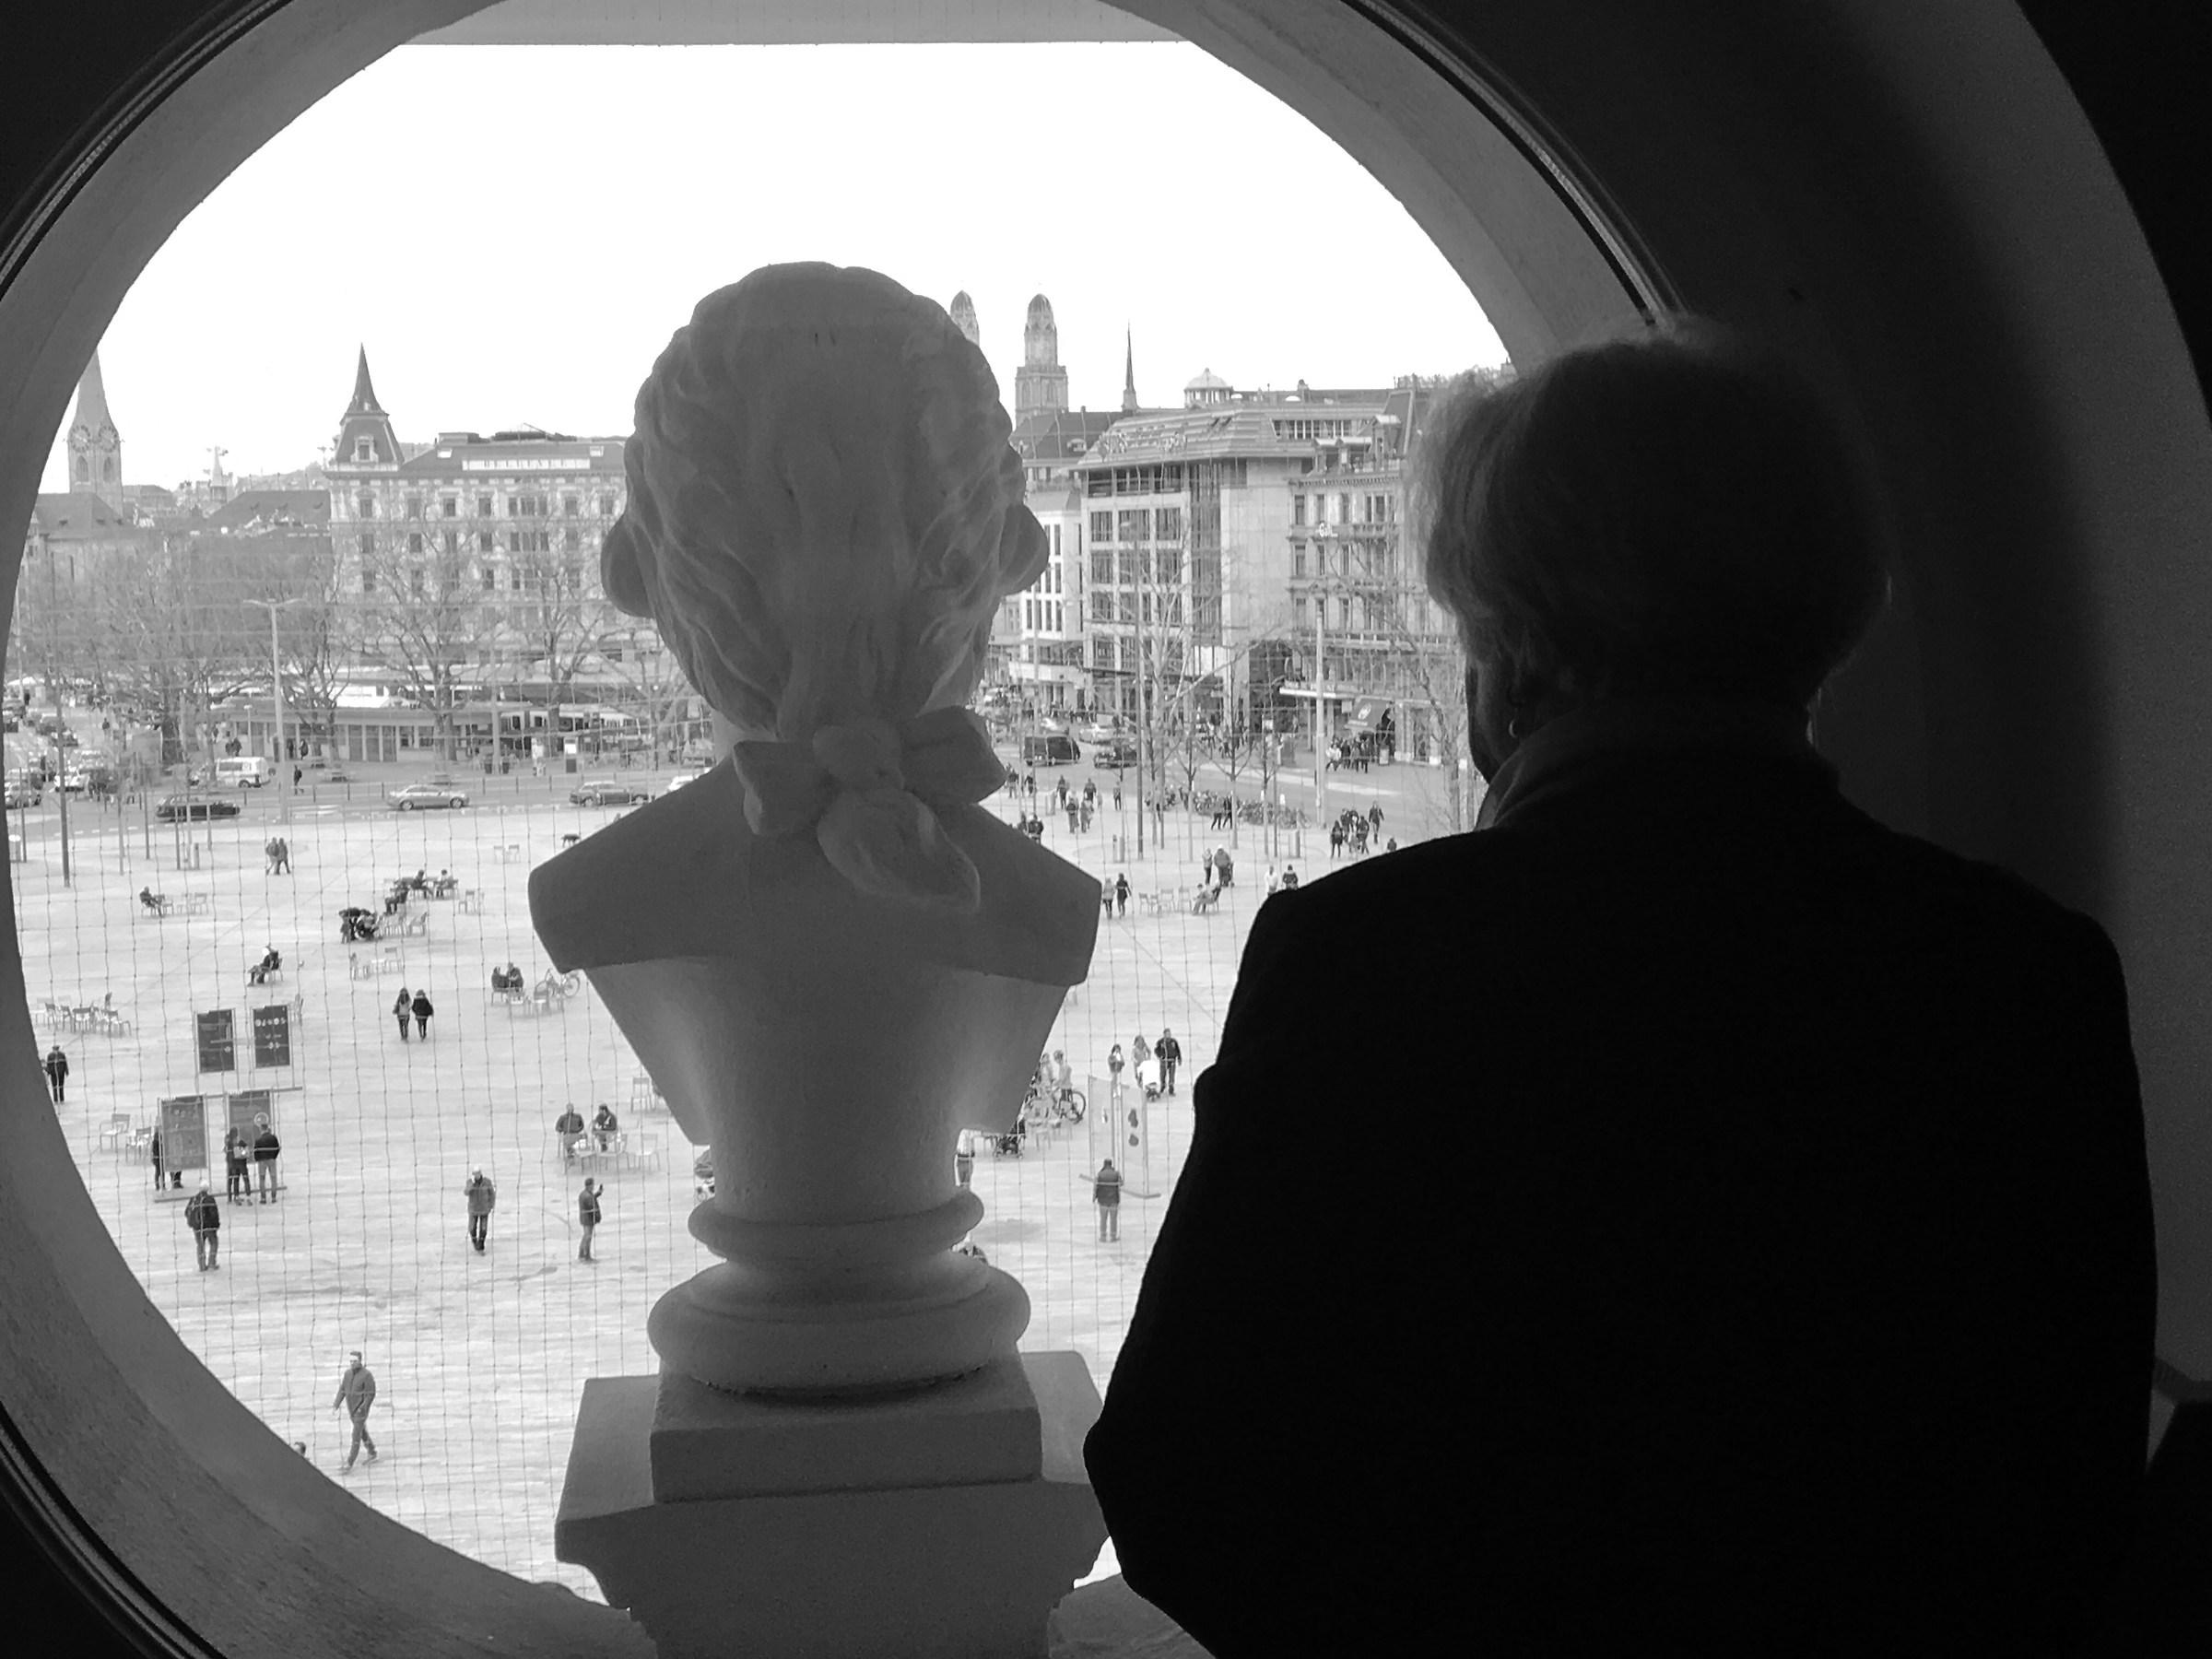 From opera window...